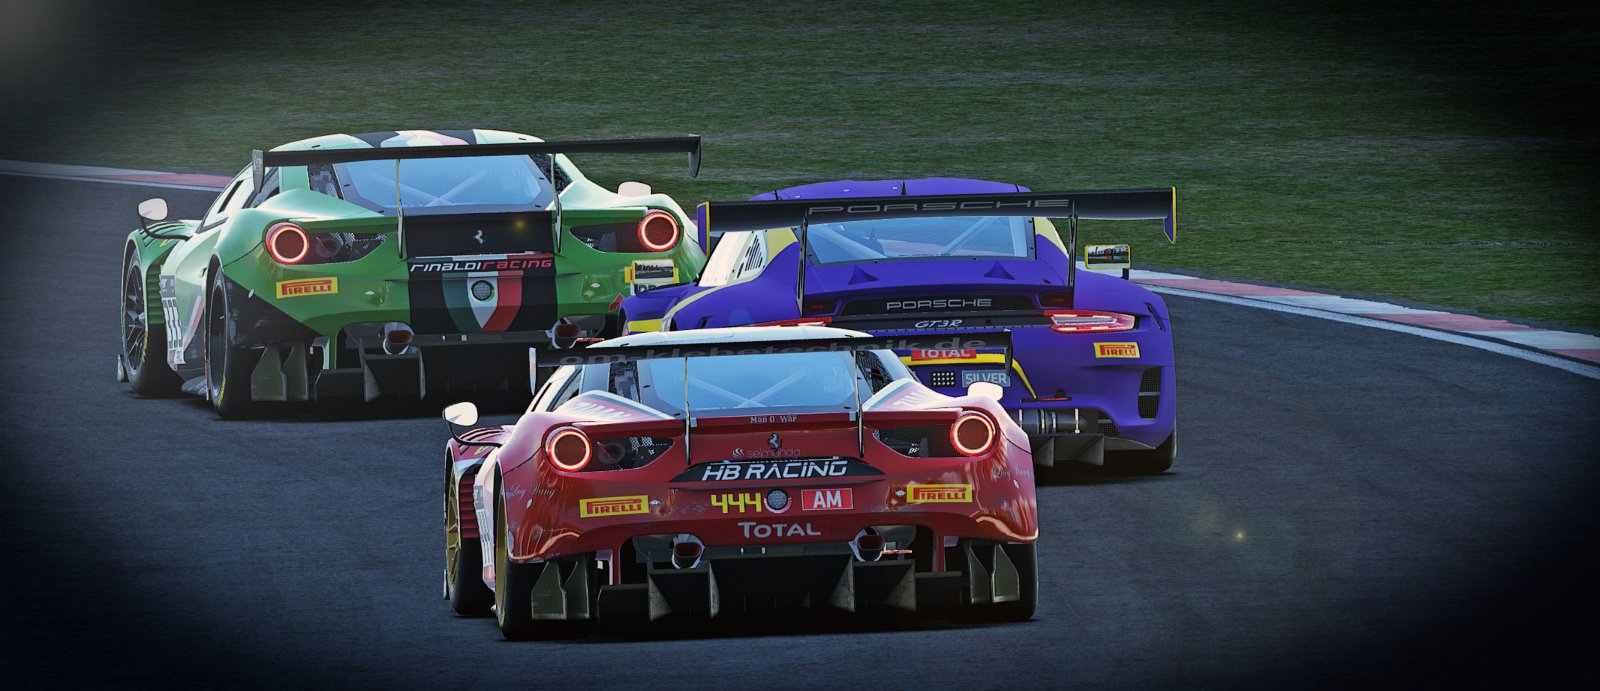 Assetto Corsa Competizione Screenshot 2020.05.20 - 00.15.55.17.jpg